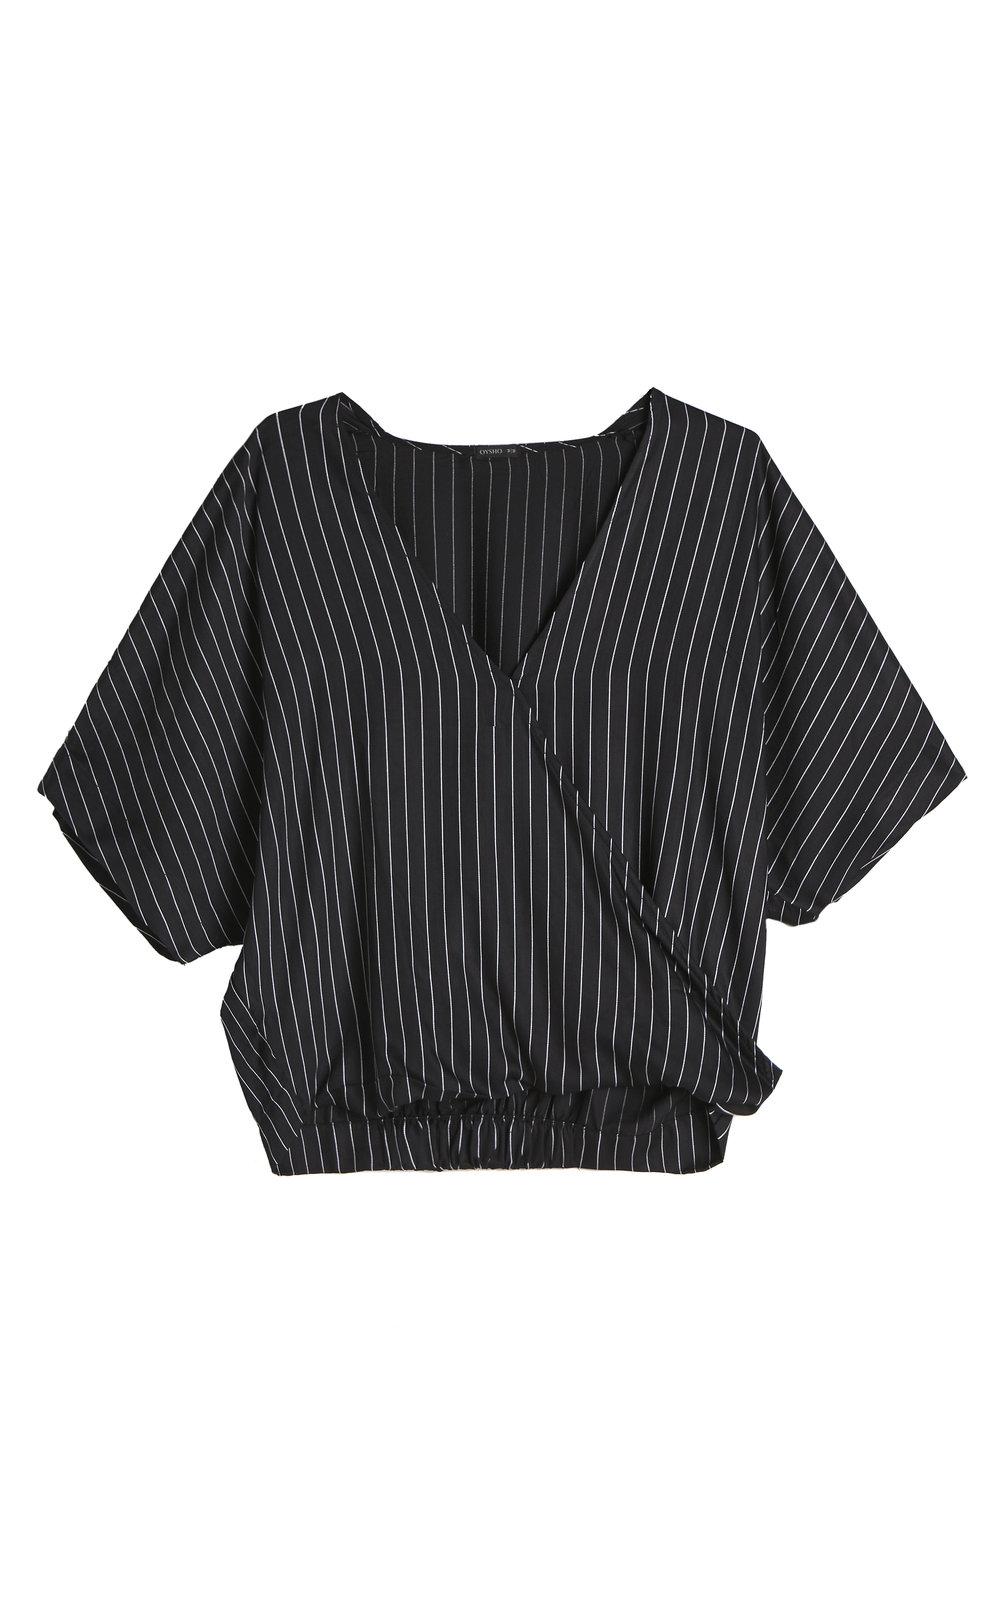 Oysho sleepwear SS17 (8).jpg